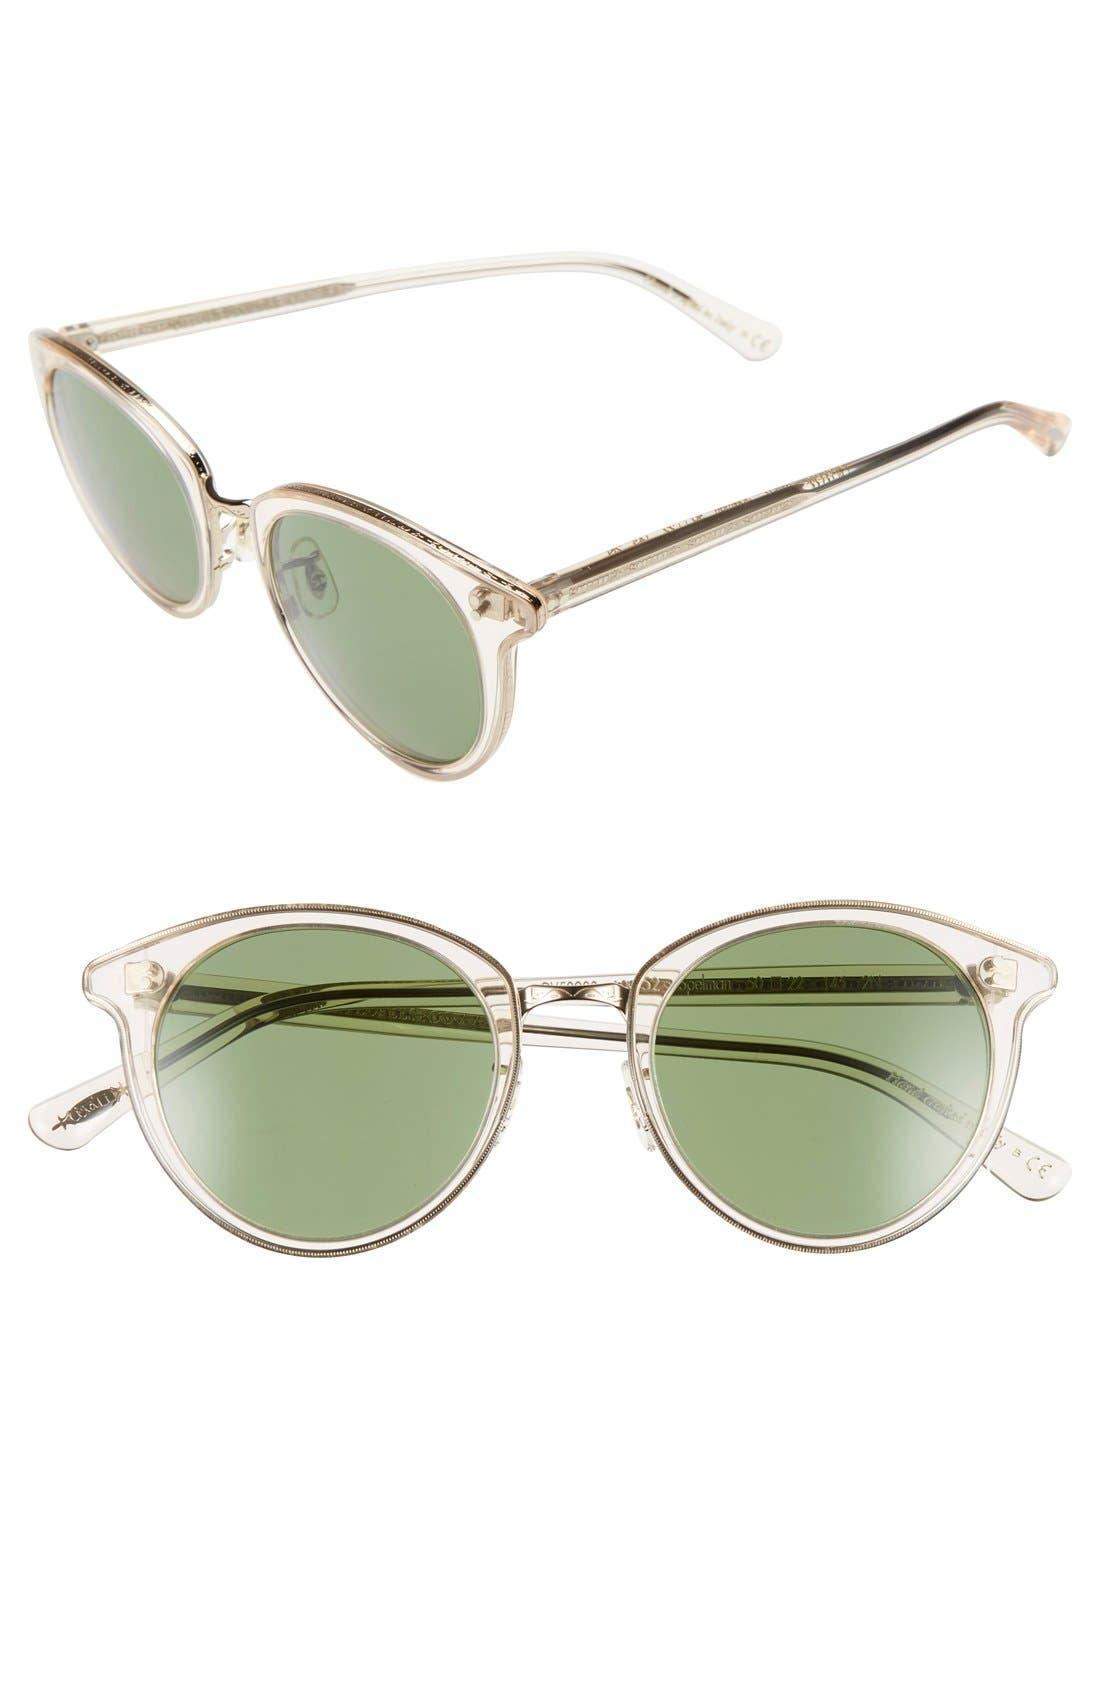 Oliver Peoples 'Spelman' 50mm Retro Sunglasses